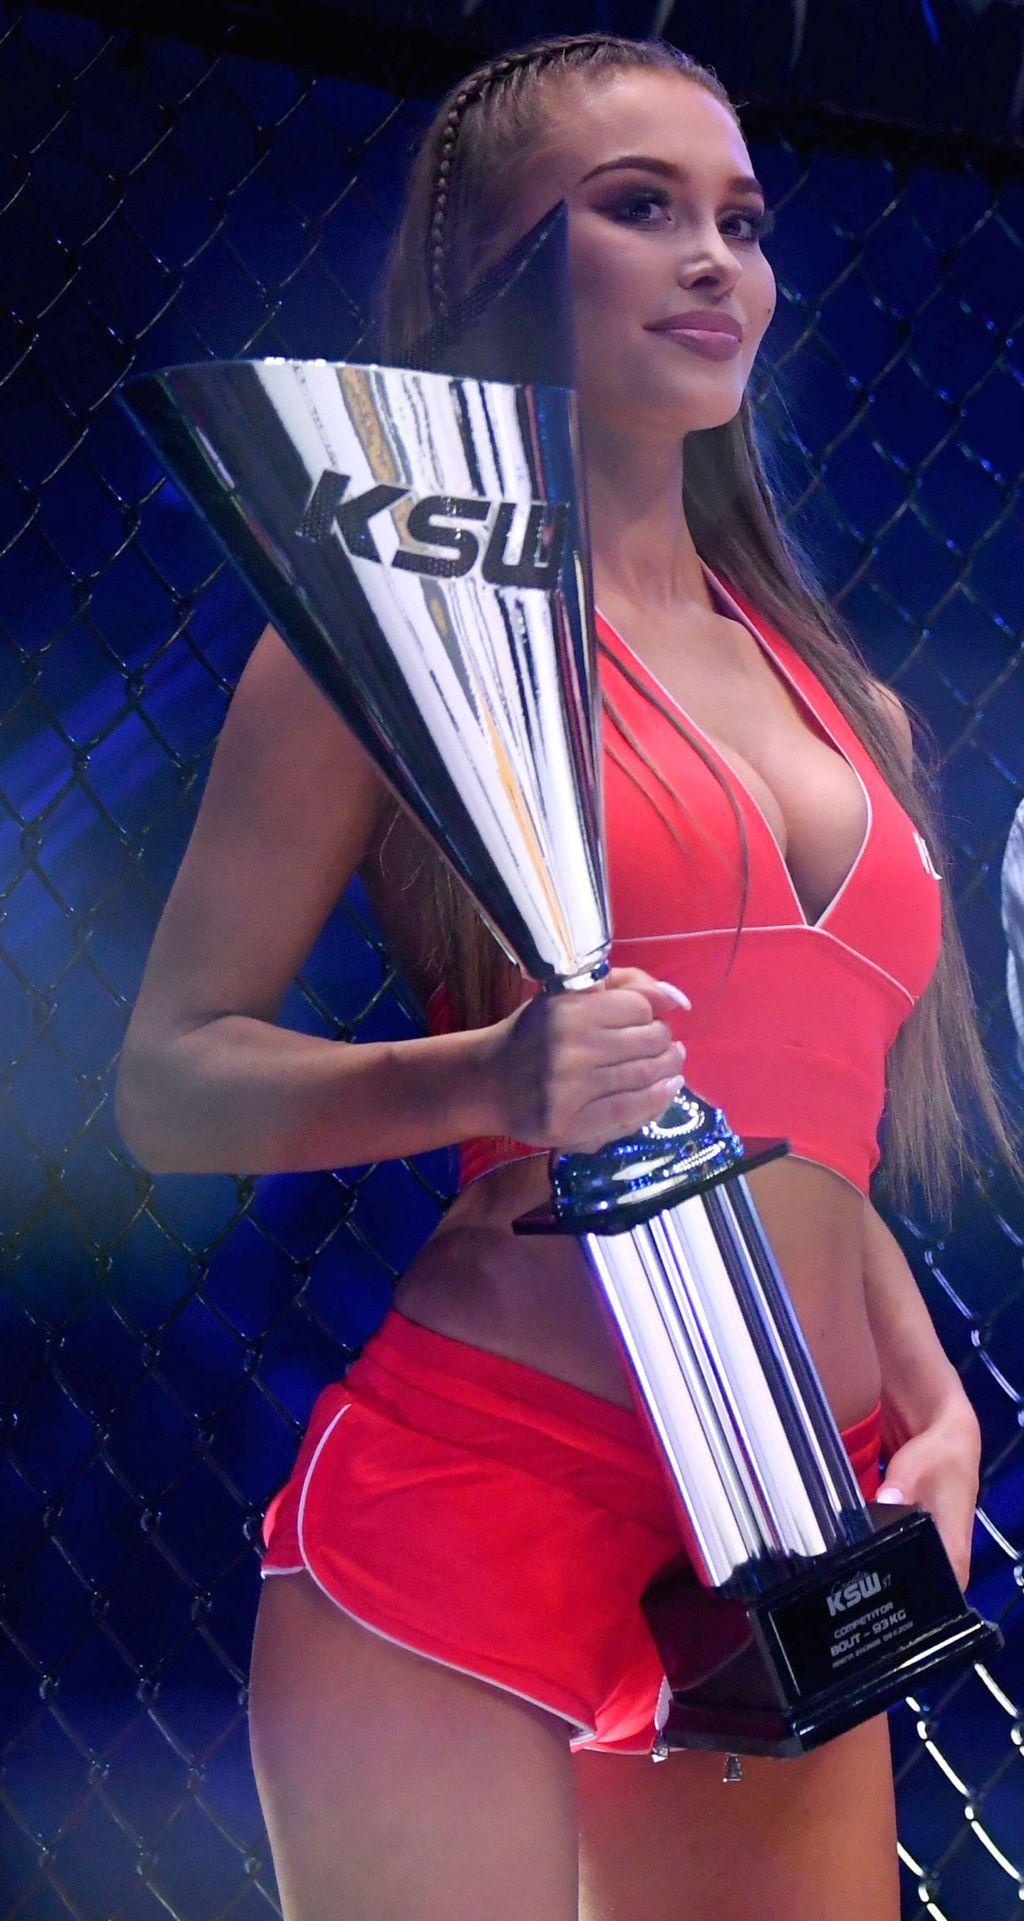 KSW ring djevojka (Foto: Marko Lukunić/PIXSELL)